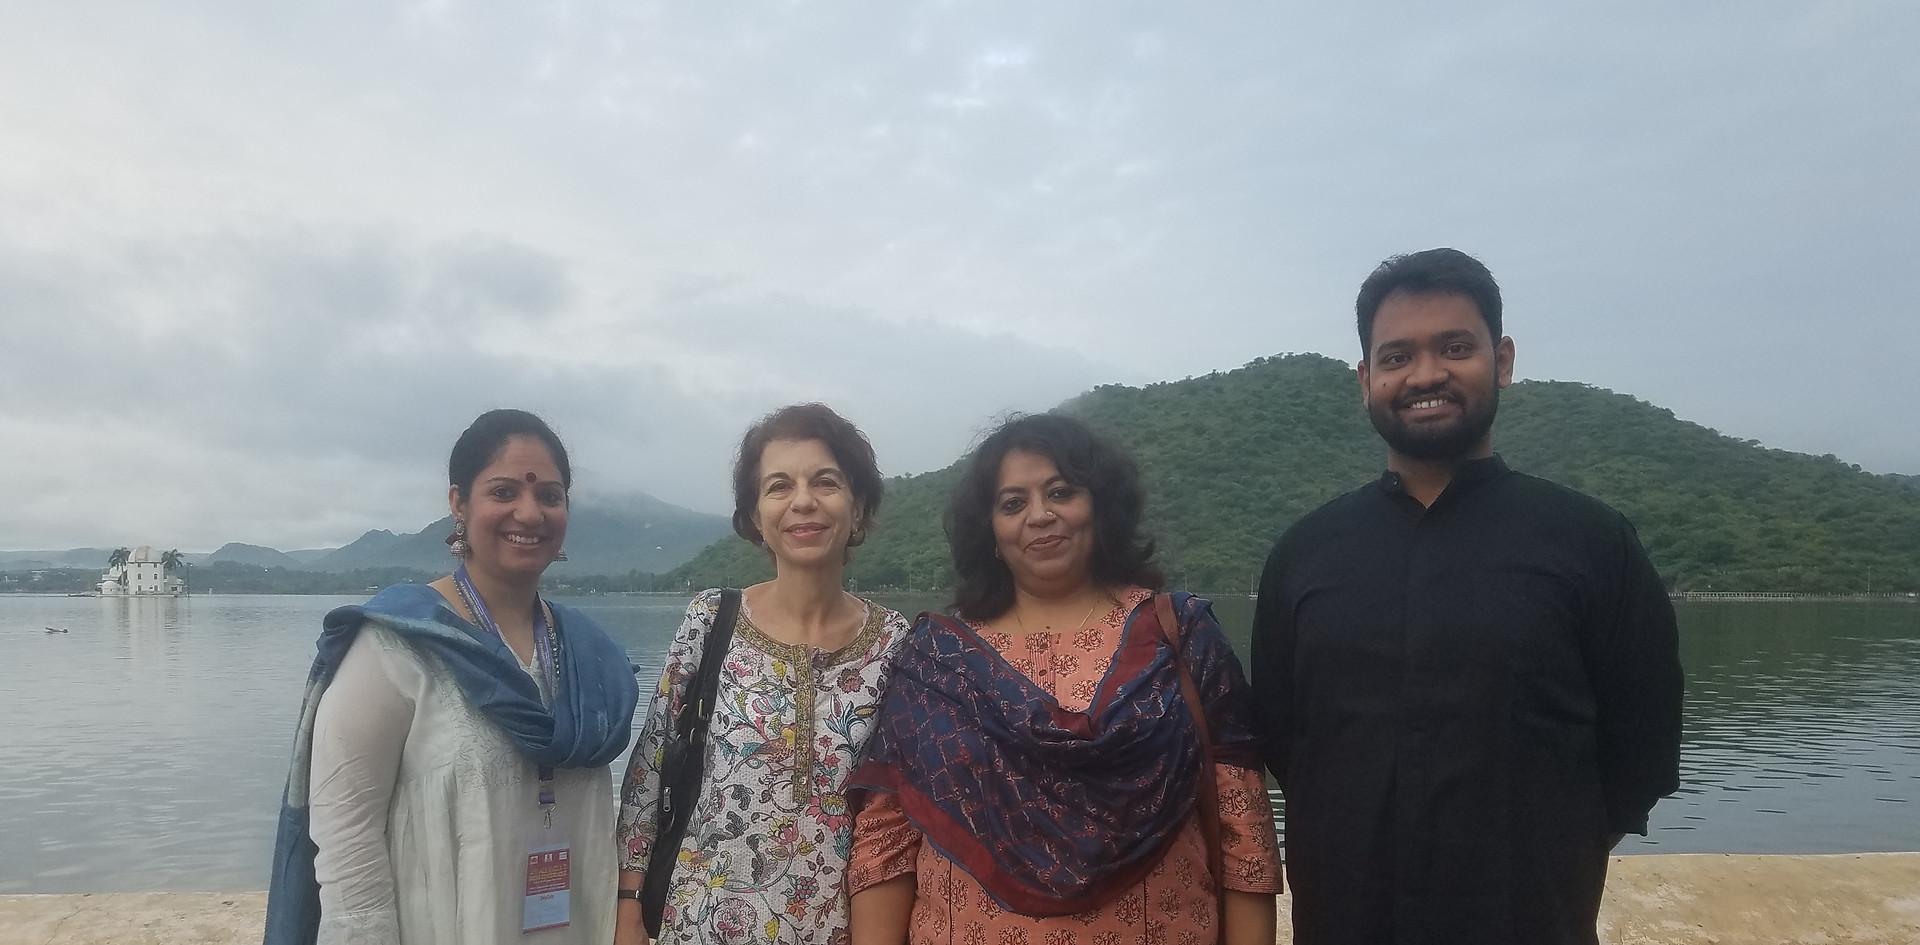 Mrs. Aditi Gaur, Editor, Blub World with Ms. Isabelle Barden - SEVEDE, PhD. Chief Field Office, Ms. Suchorita Bardhan Communication Specialist at UNICEF India, and Mr. Daksh Gaur, Founder, Blub World